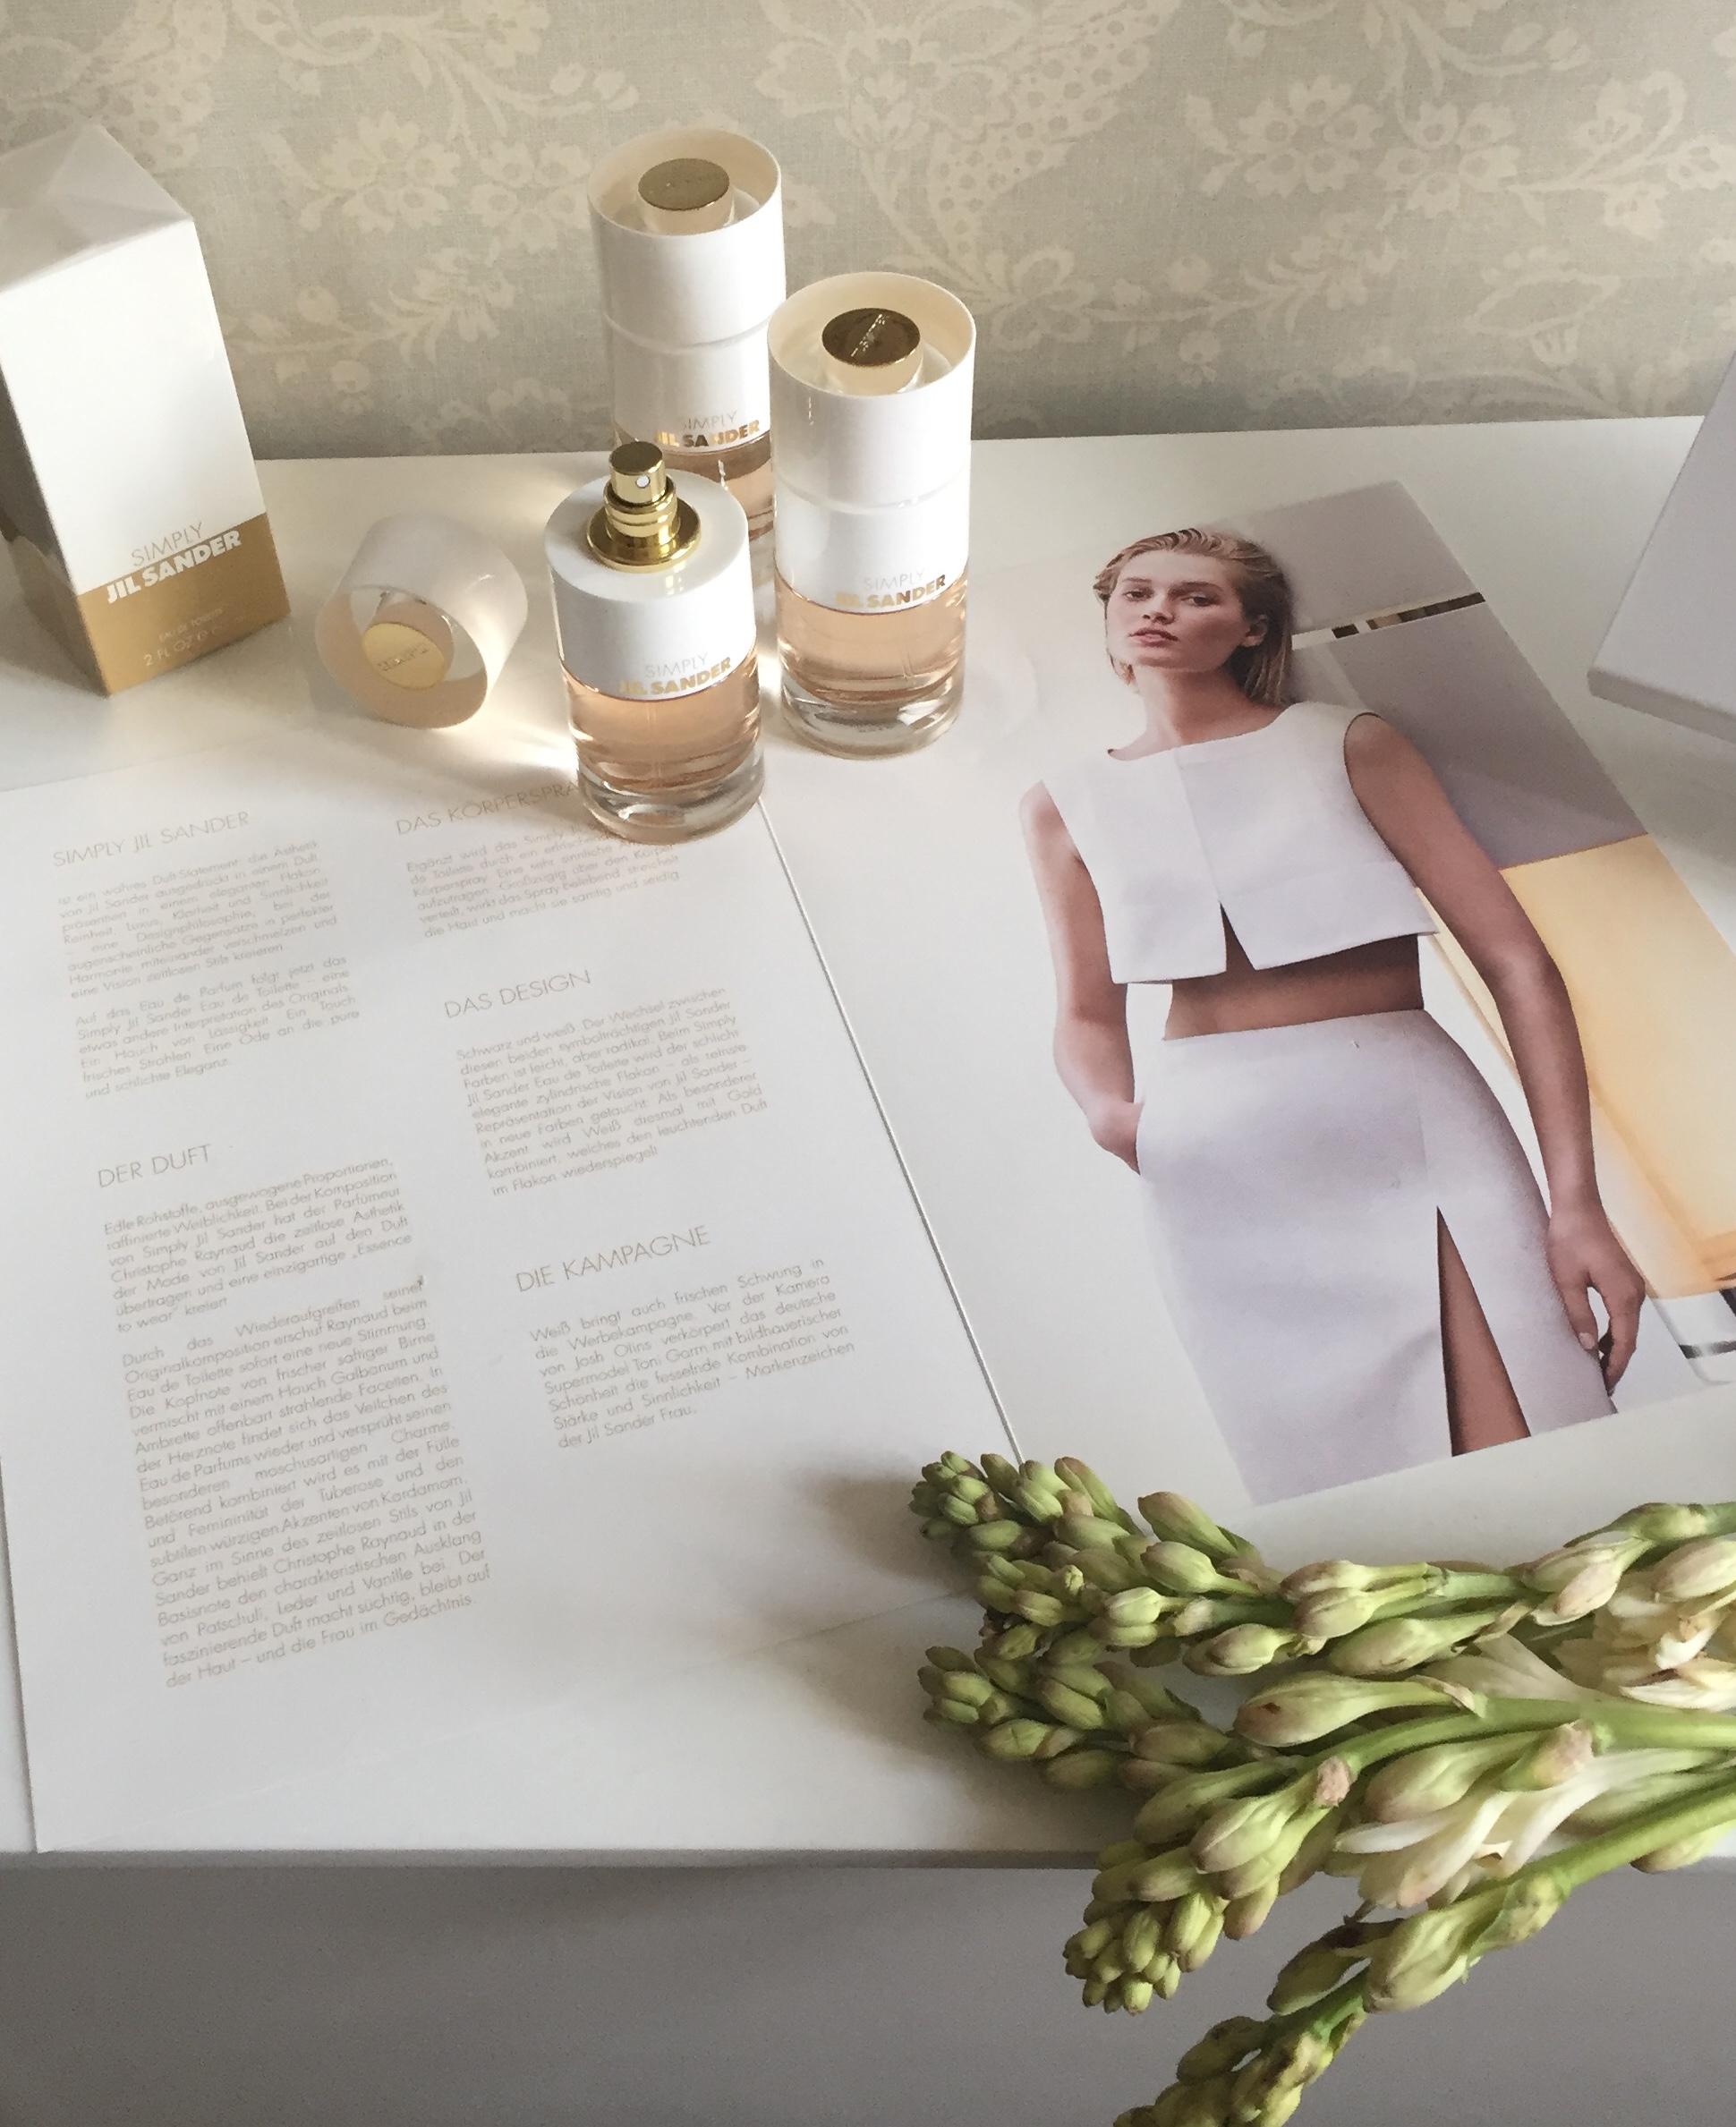 MBFW, Fashion Week, Berlin, SOHO House, Blogger Boxx, Secret Suite, Jil Sander